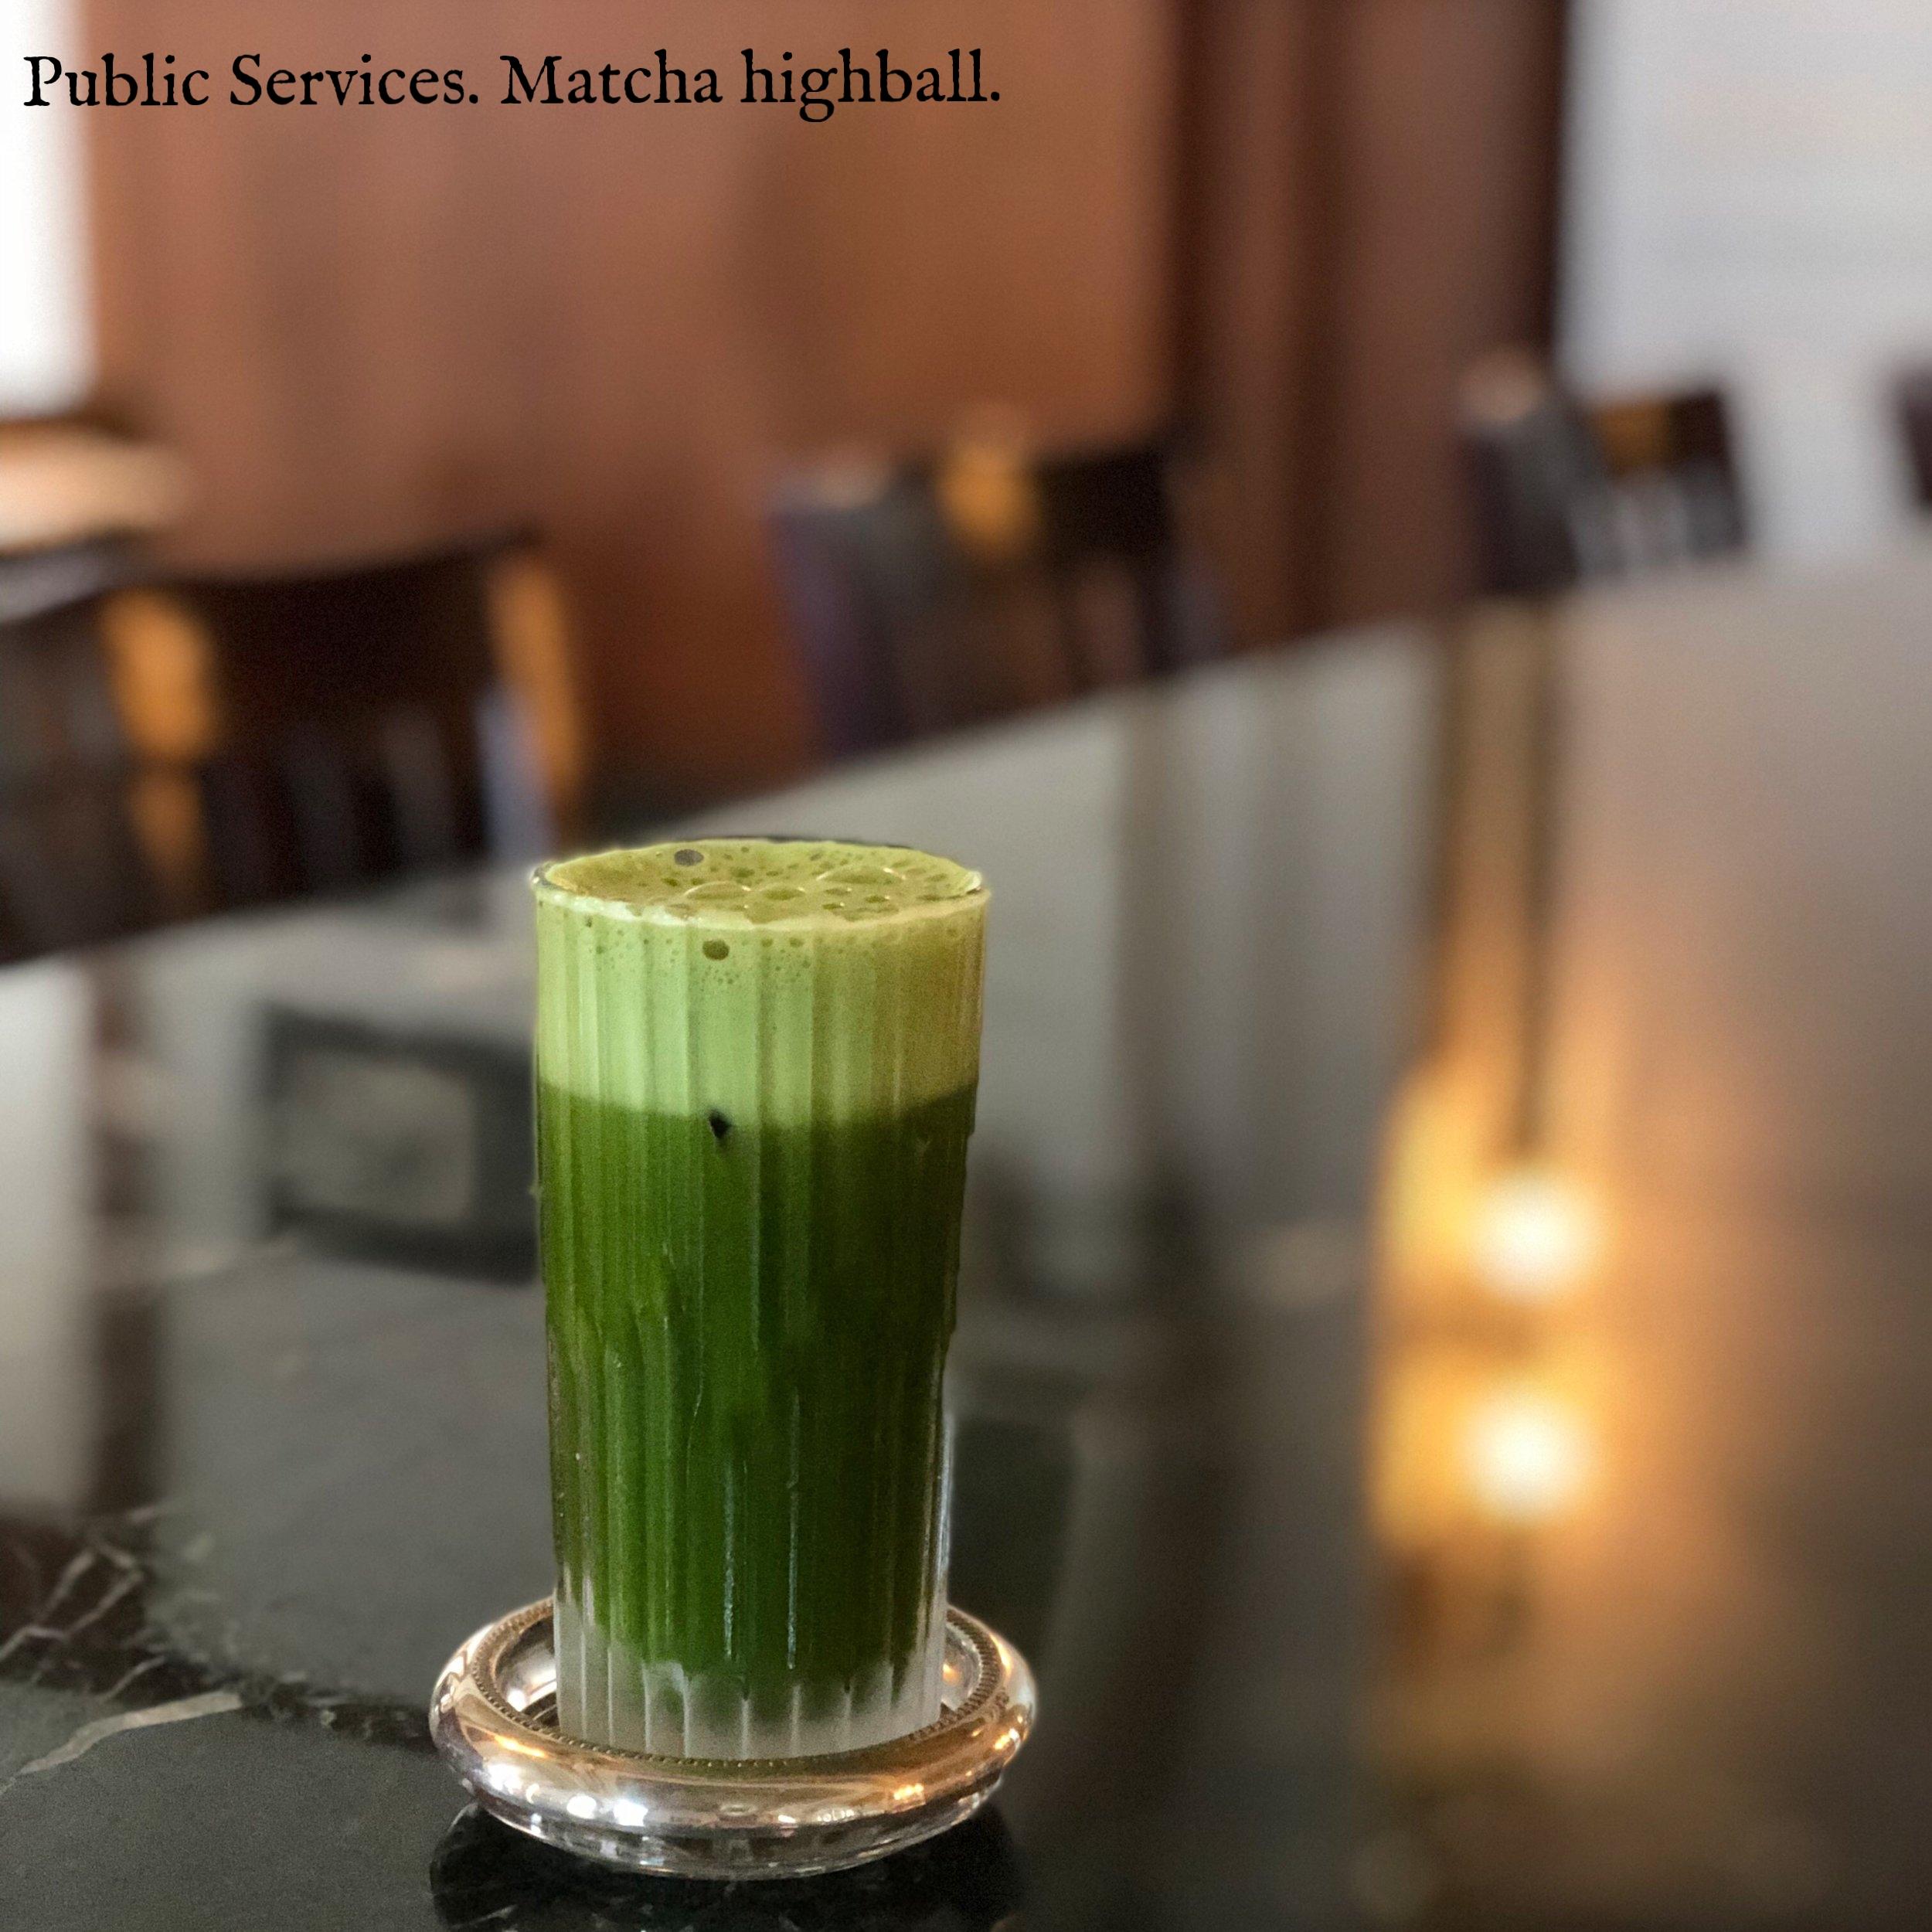 Public Services.Matcha Highball by Justin Vann.JPG